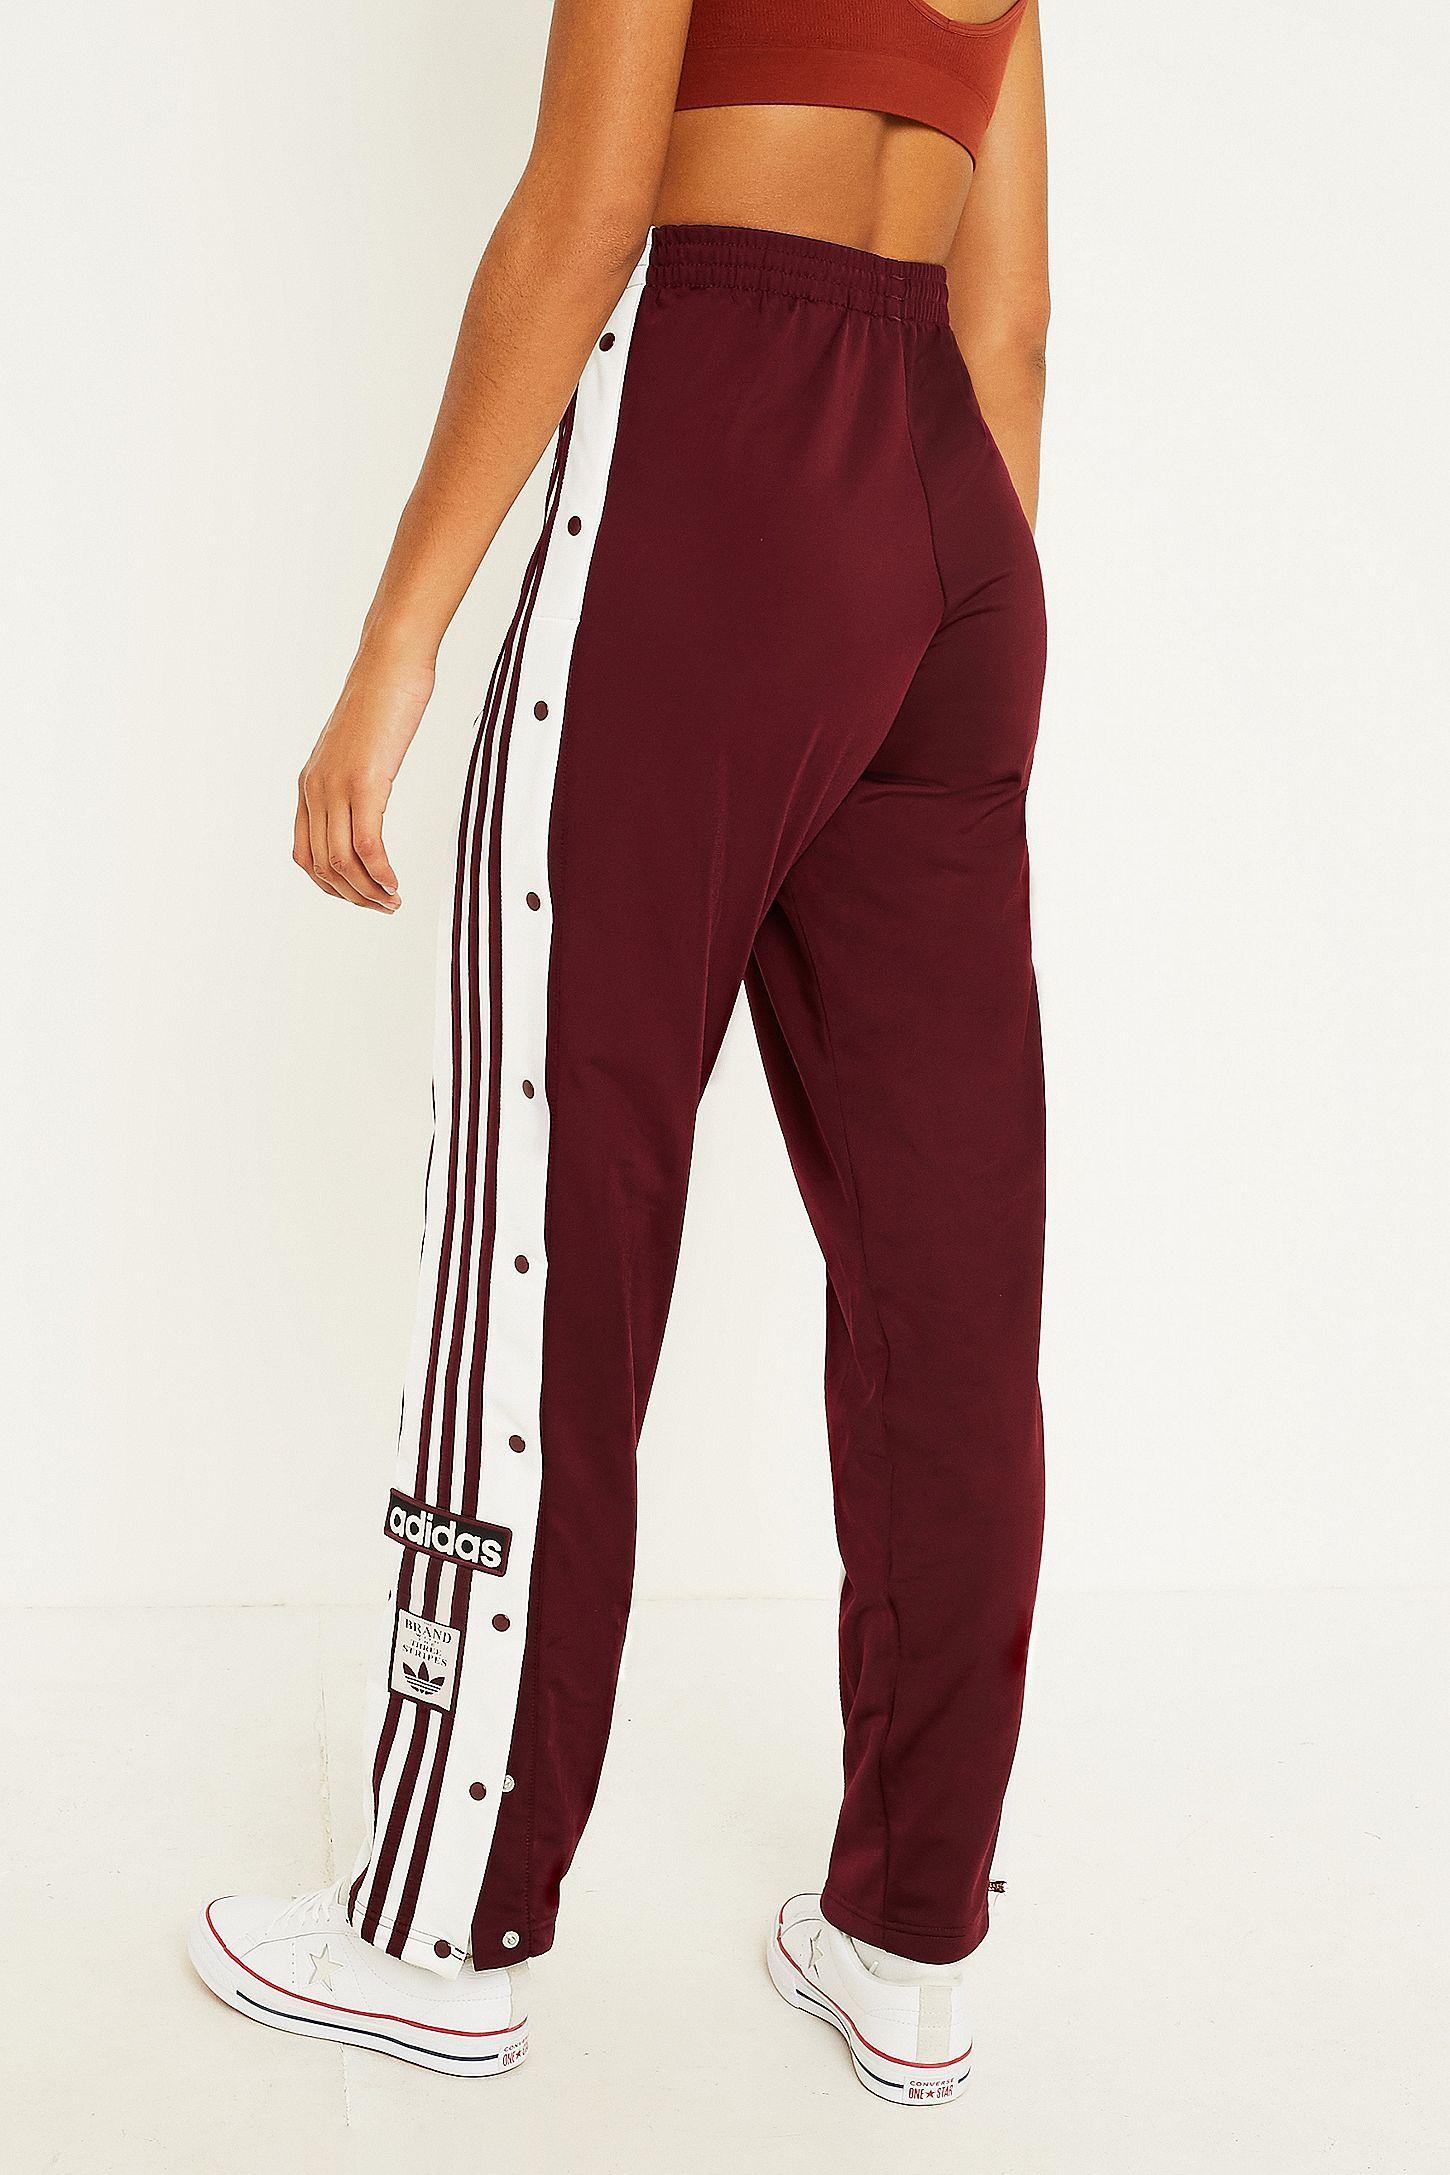 adidas Originals Adibreak Popper Track Pants In Maroon Red